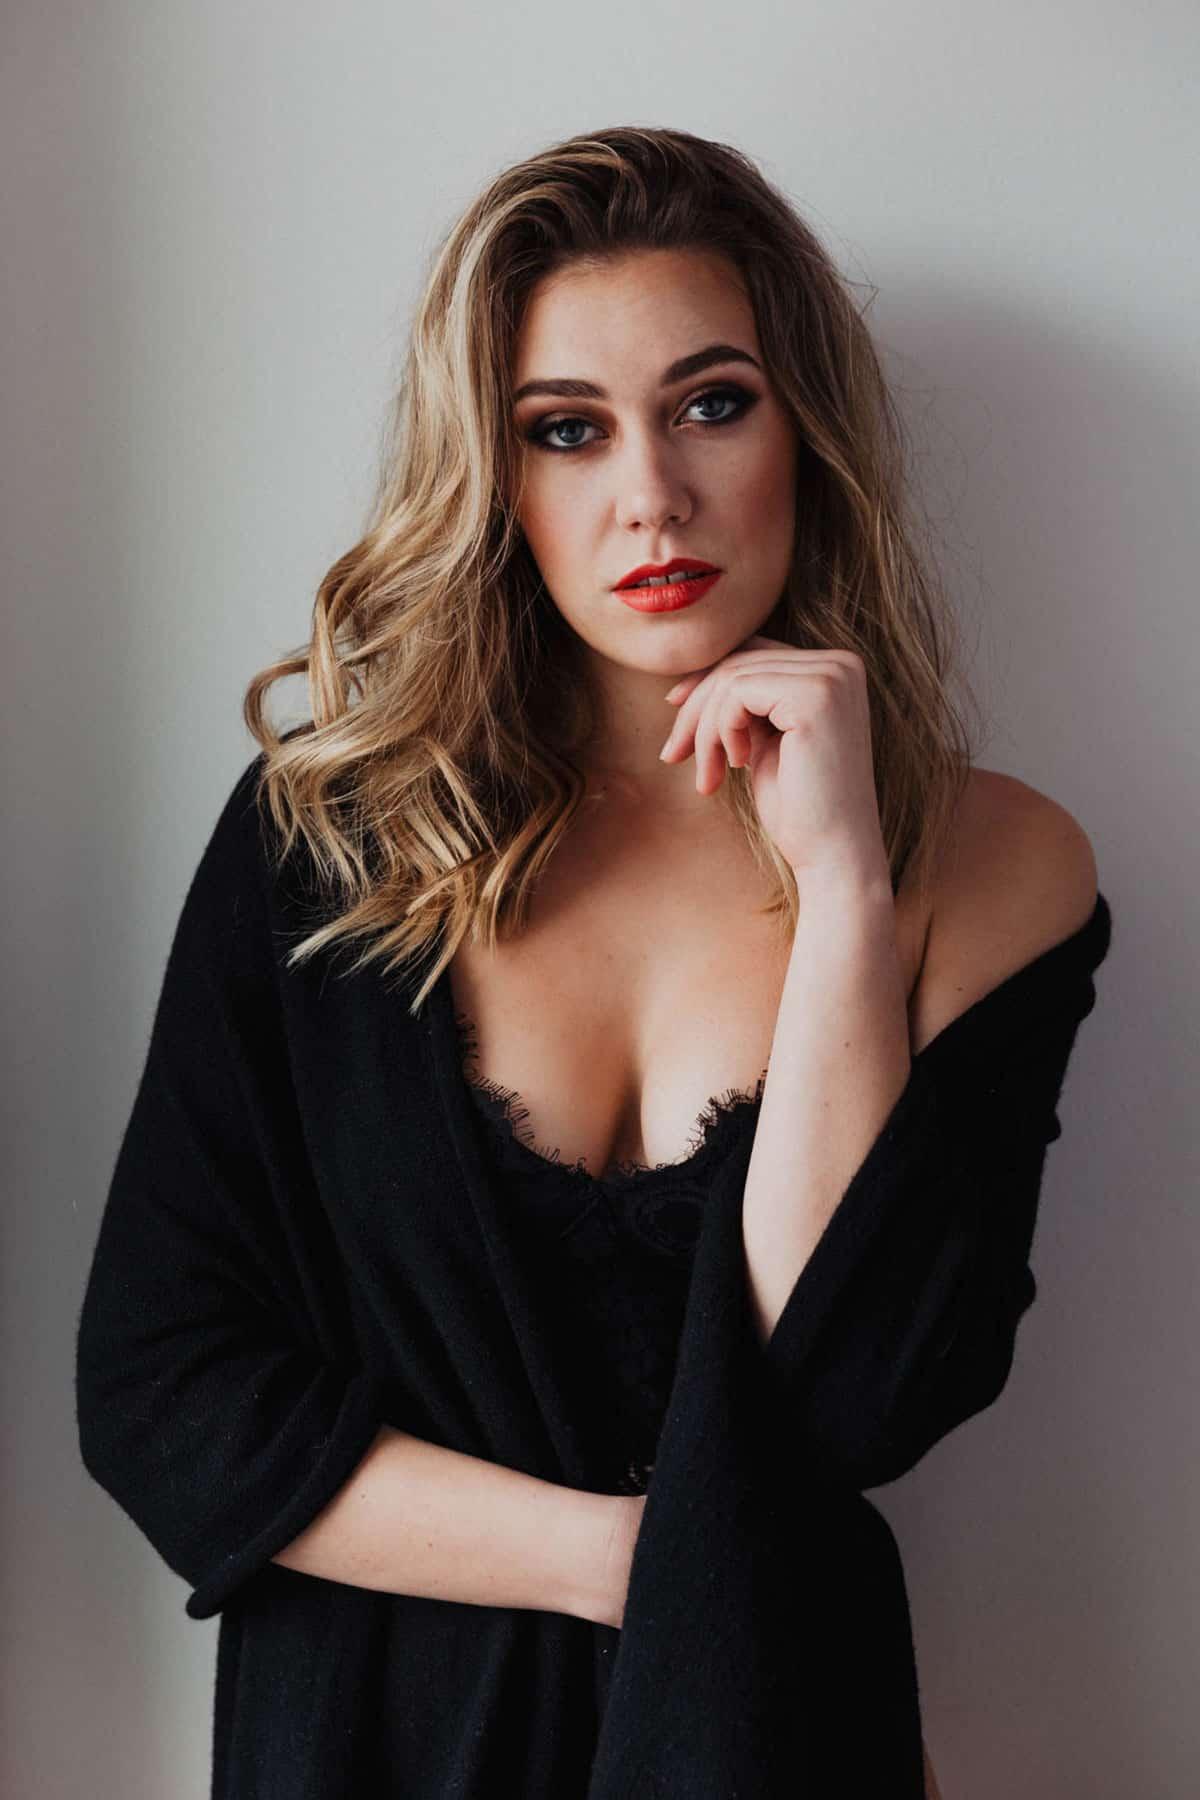 Selbstbewusste junge Frau mit intensivrotem Abend-Make-up